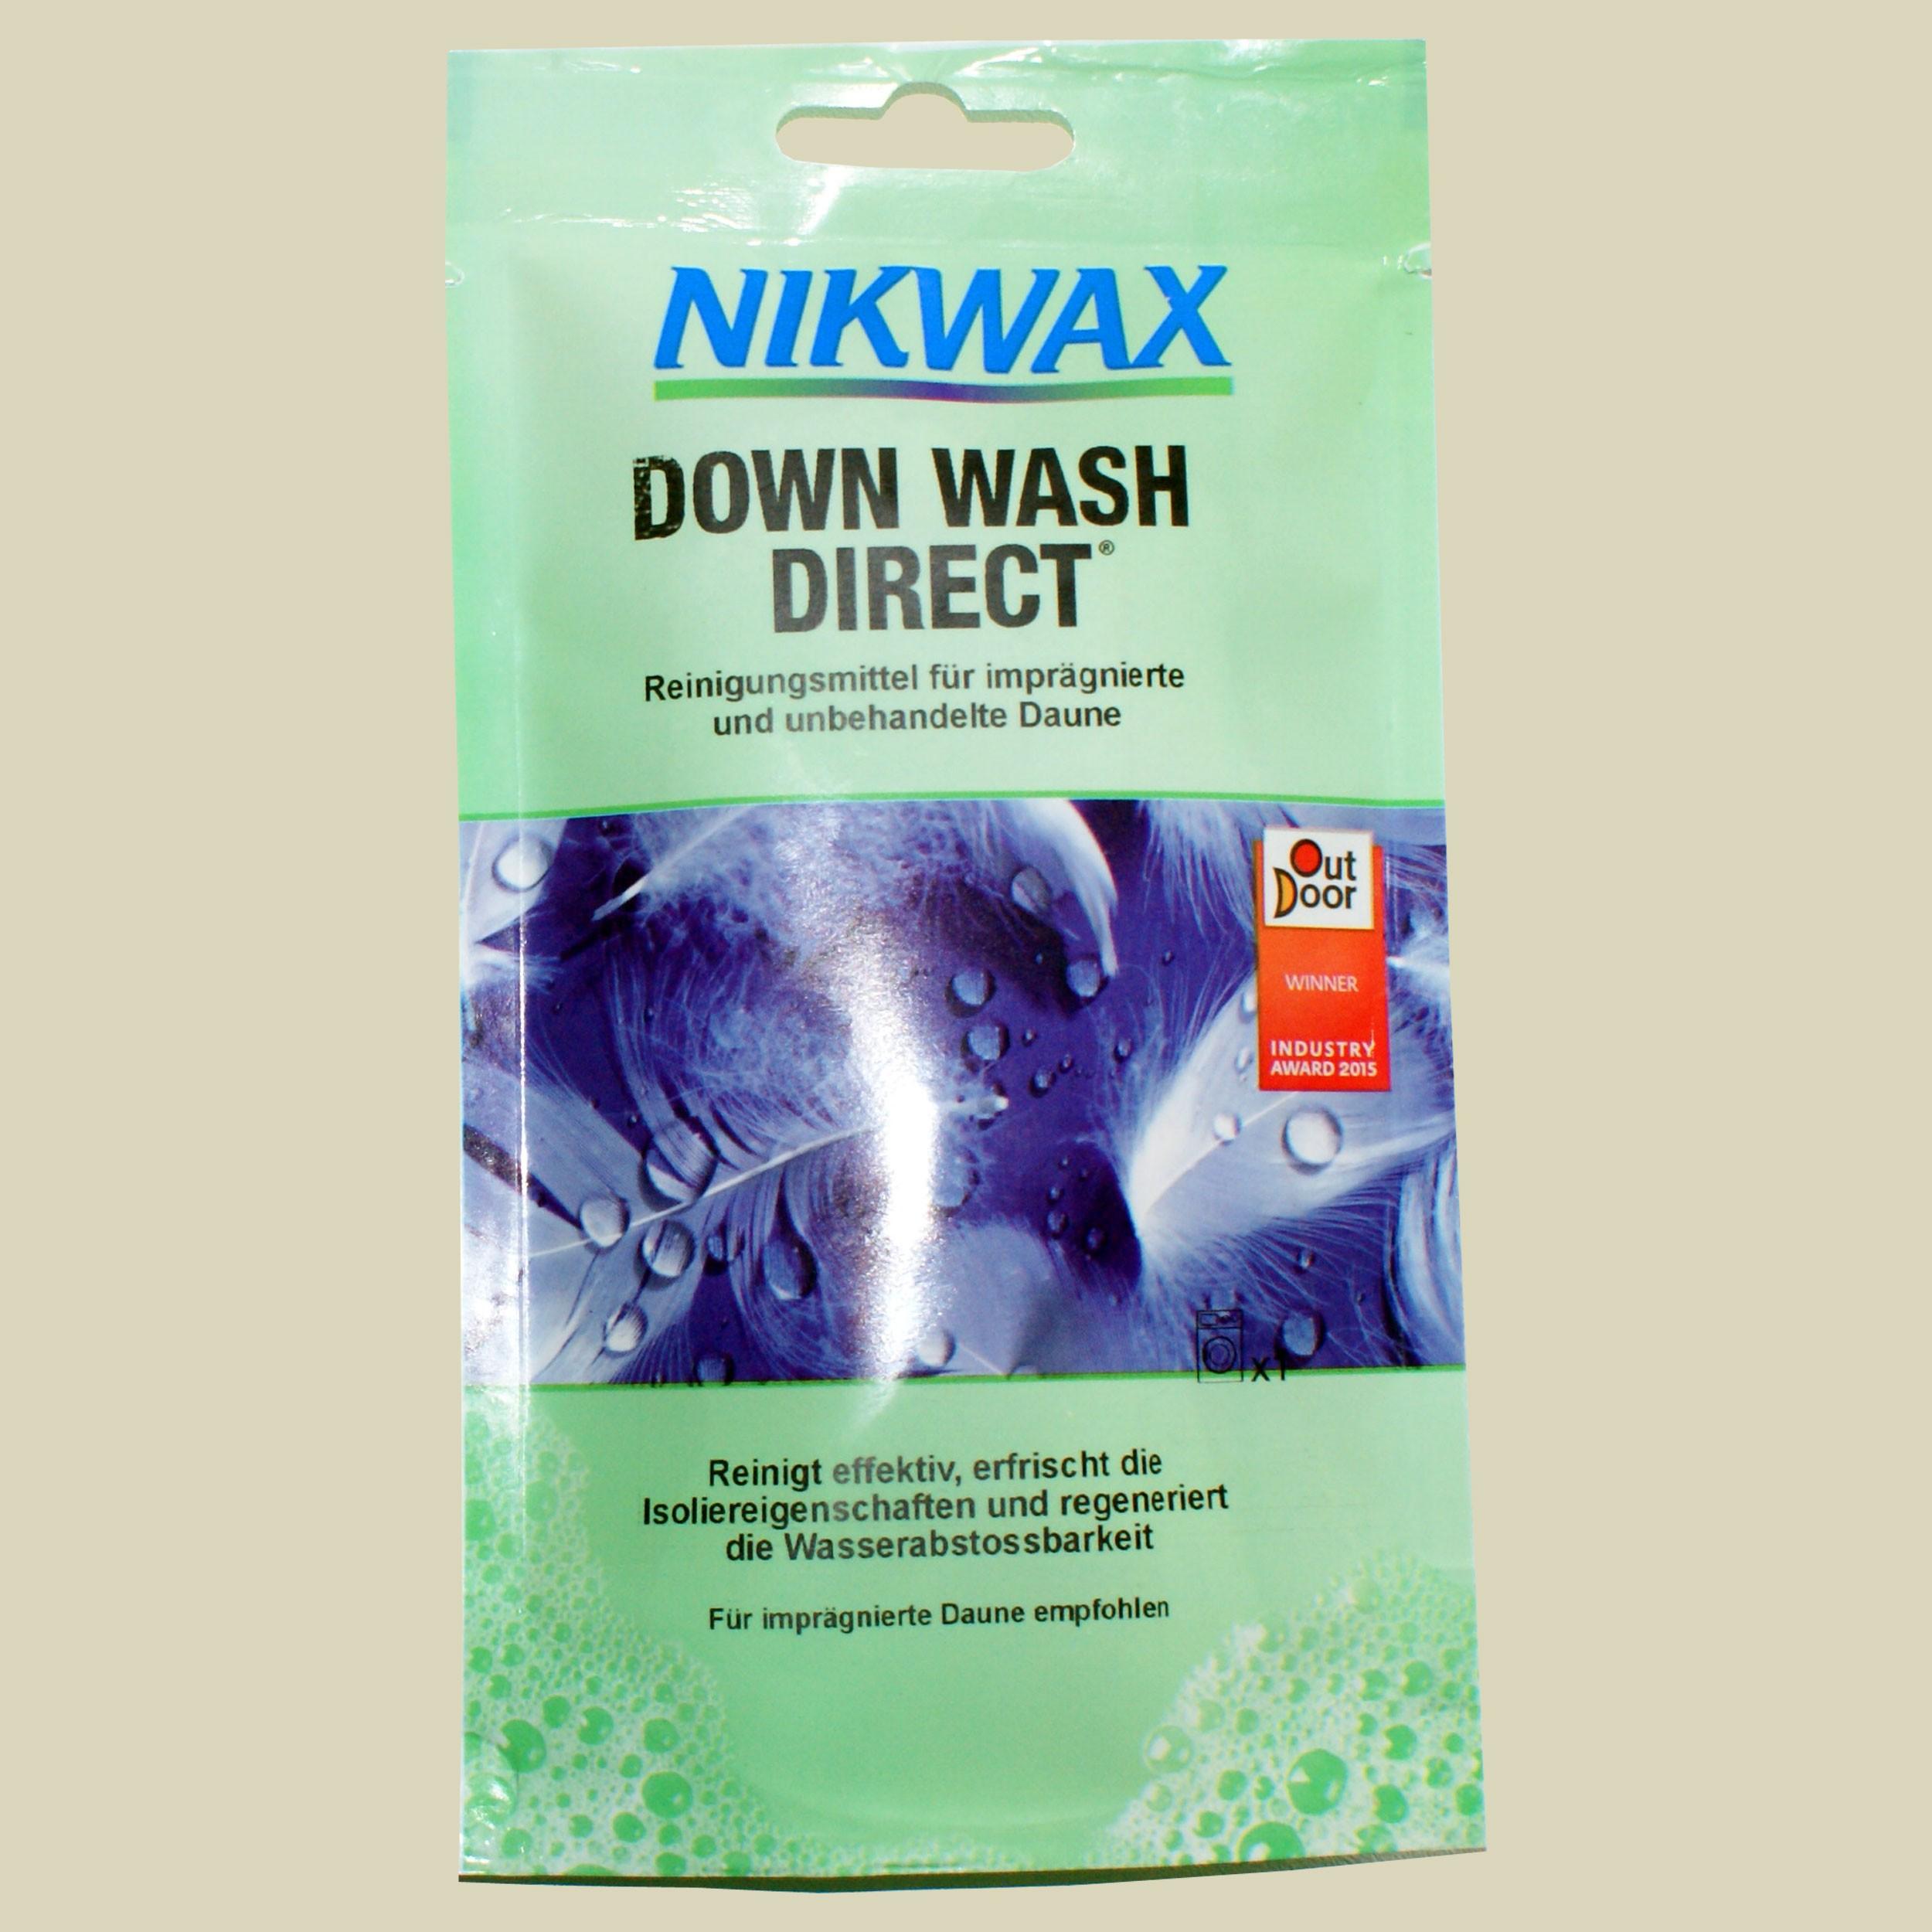 nikwax_down_wash_direct_100ml_5020716175200_fallback